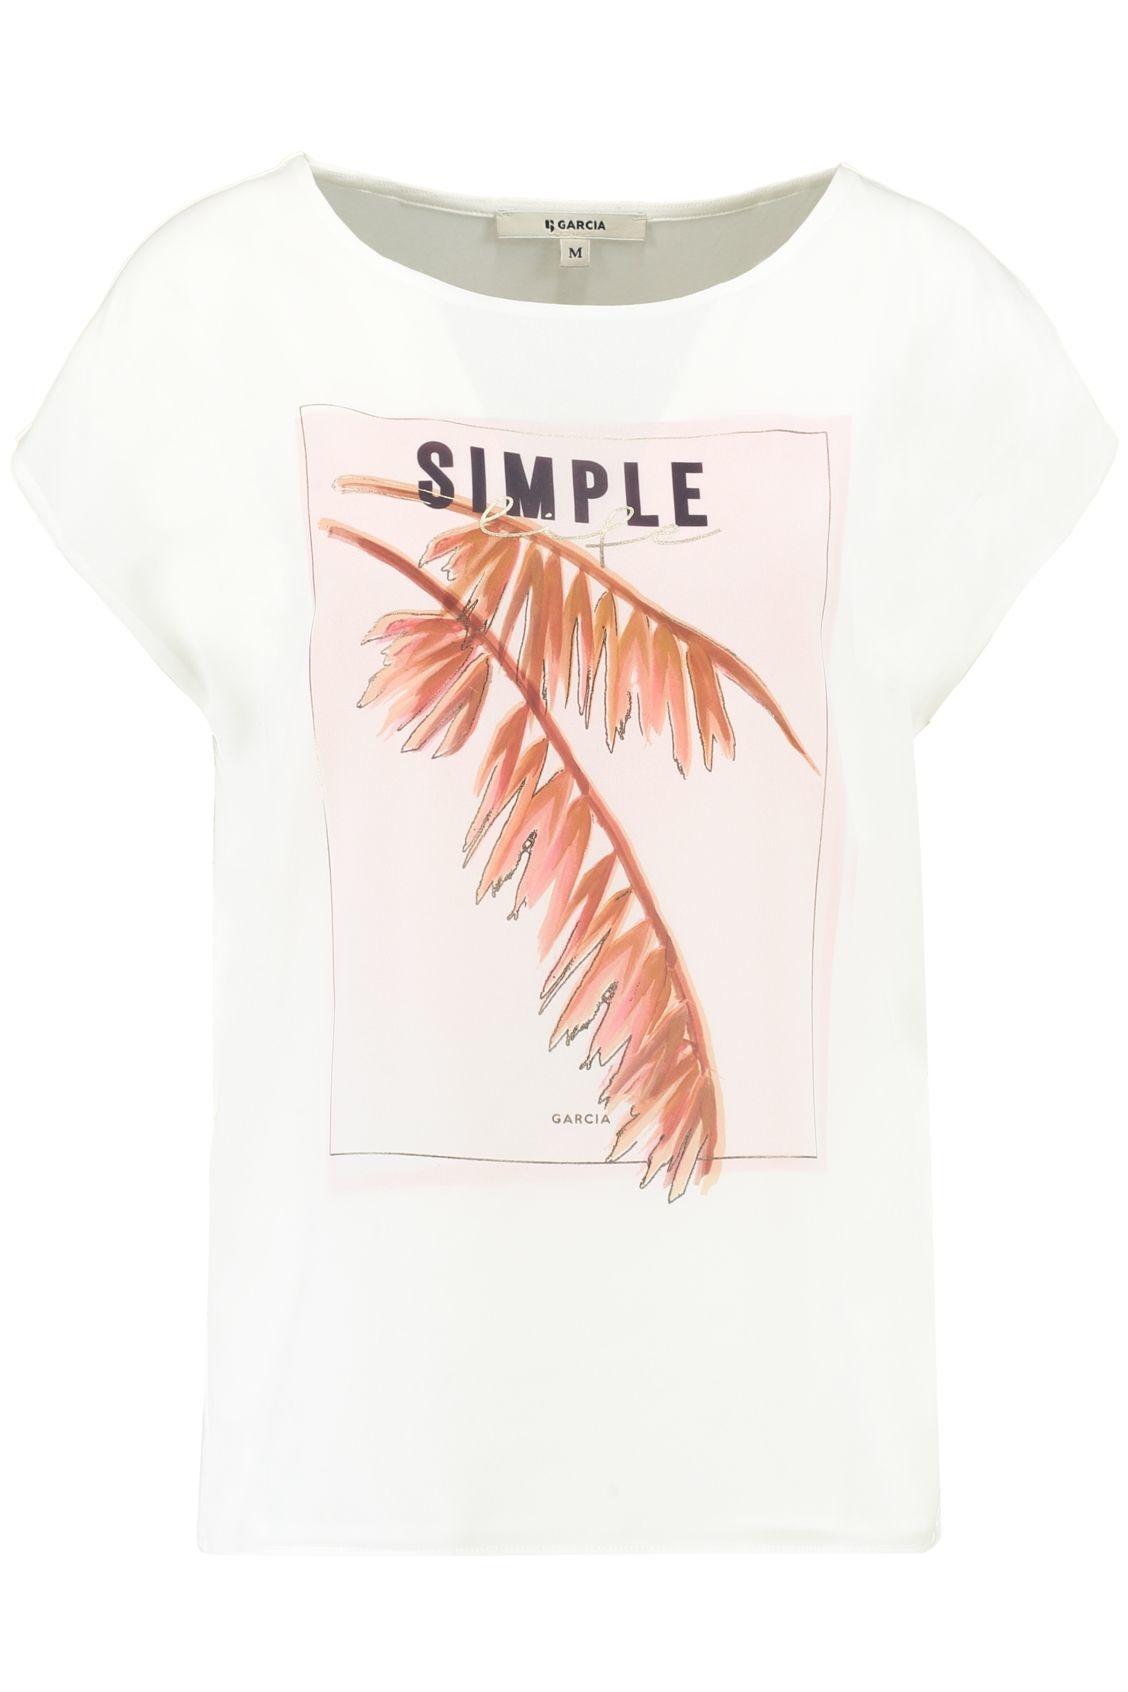 Garcia T-shirt blouse